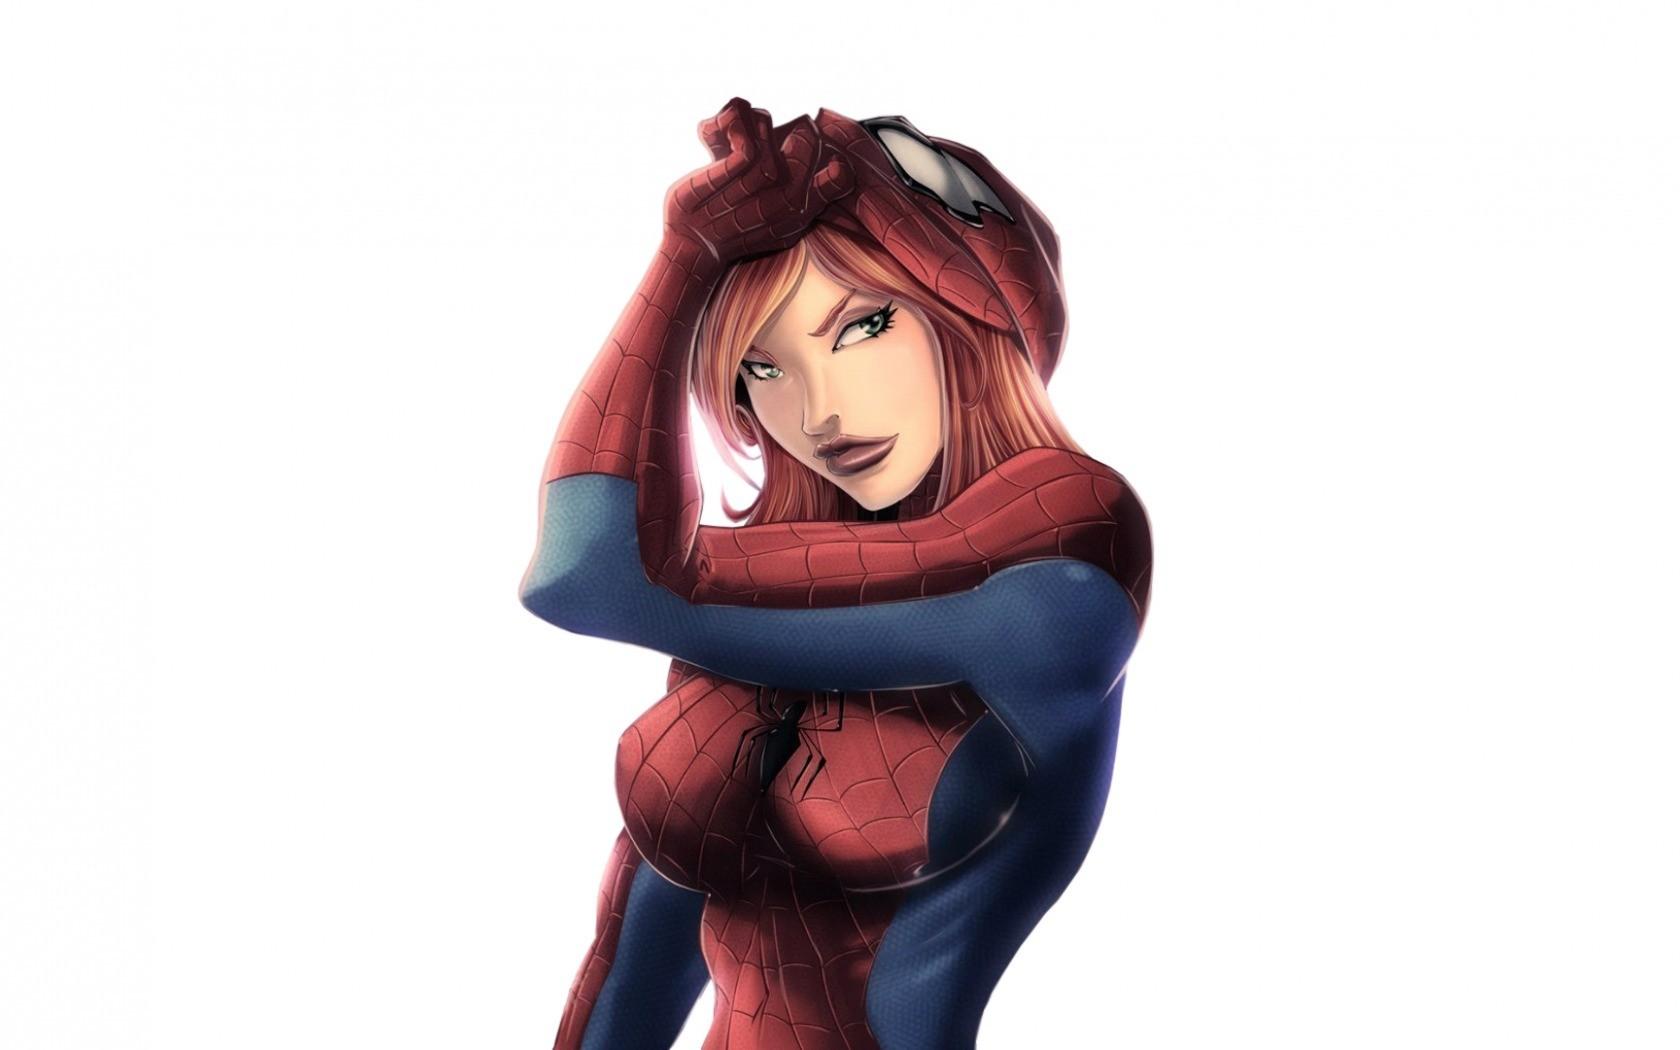 General 1680x1050 Marvel Comics superheroines Spider-Girl Mary Jane Watson